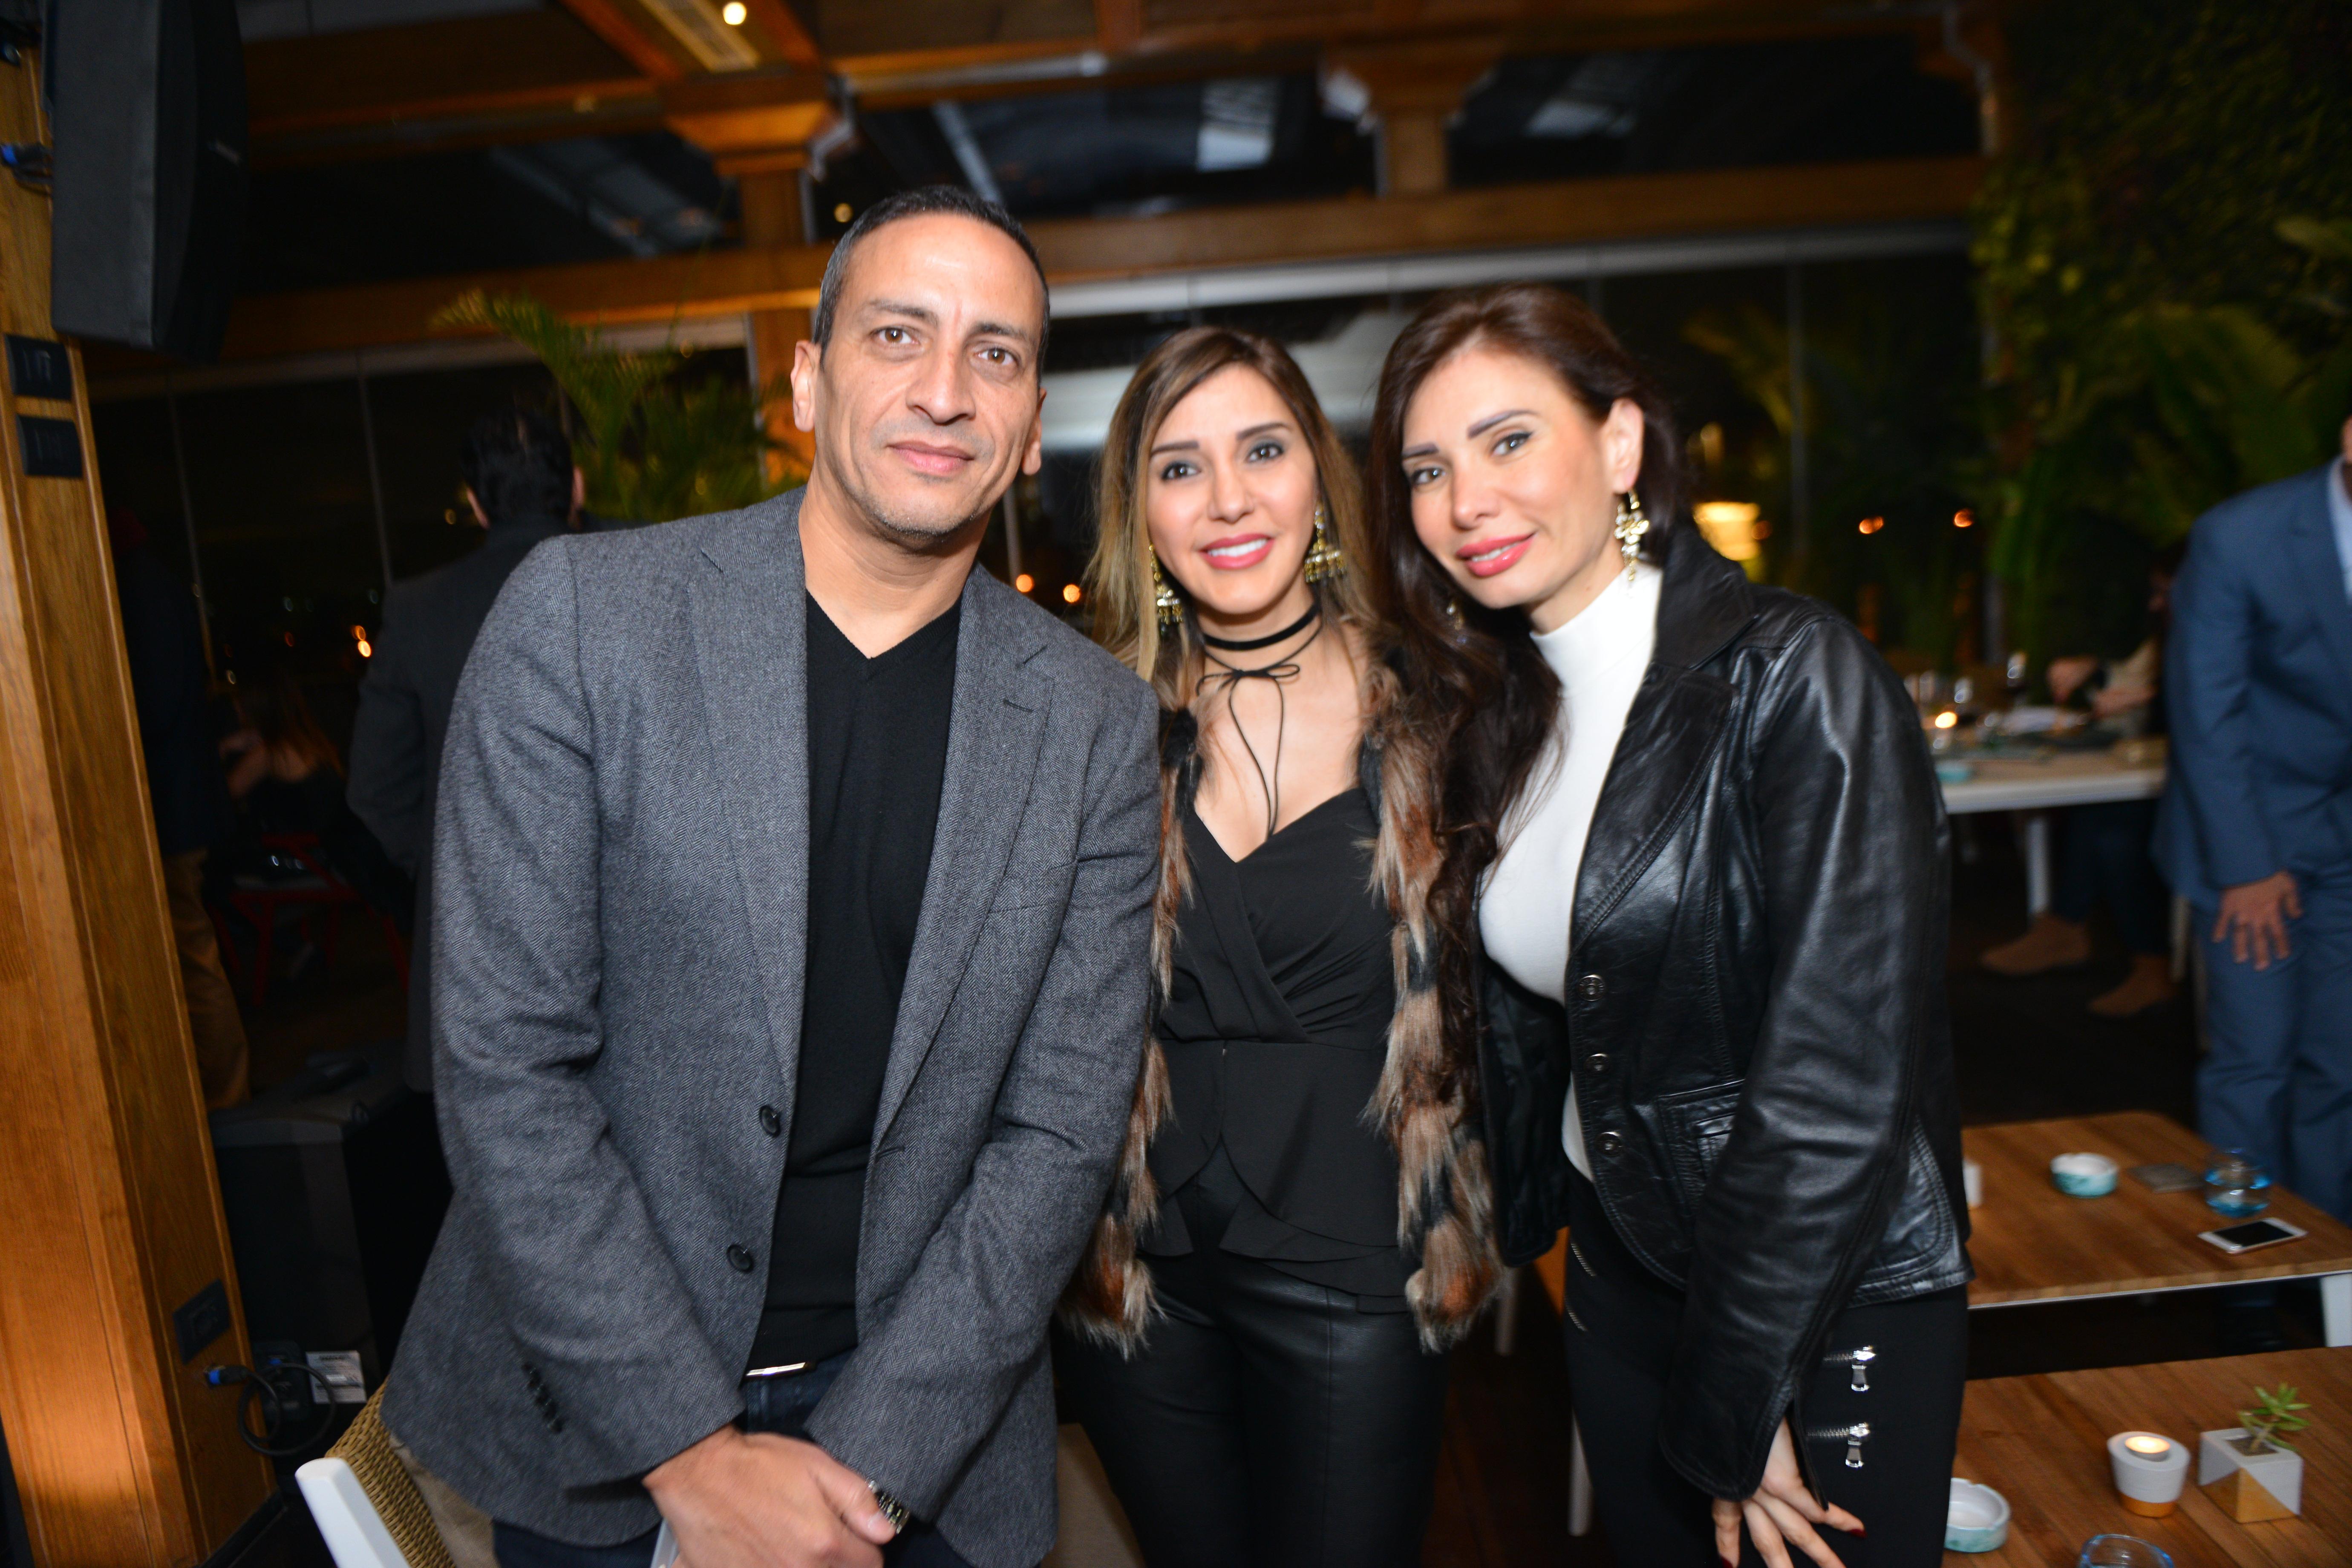 Mr. Amr Hussein, Ms. Mona Tawfik & Ms. Diana Nasser